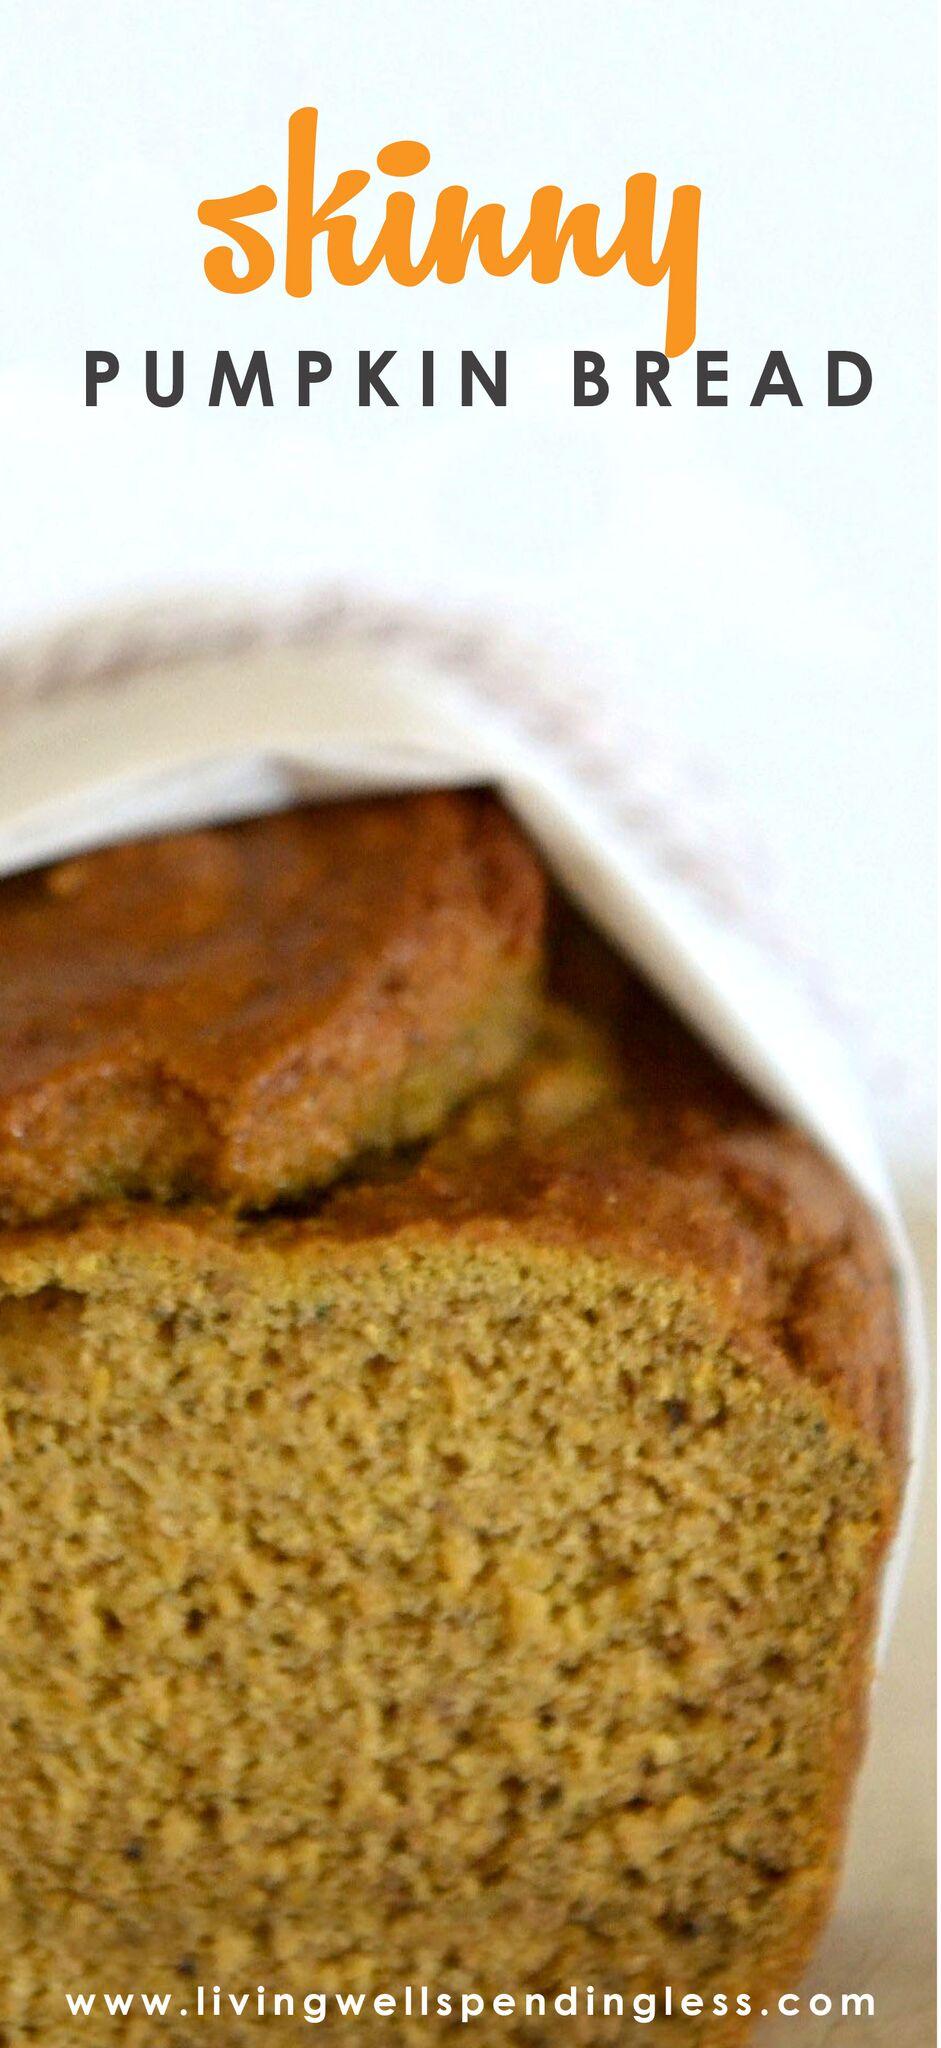 Skinny Pumpkin Bread   Healthy Pumpkin Bread Recipe   Breakfast Meal   Holiday Food   Vegetarian Food Choices   Eat Healthy   Pumpkin Bread   Healhty Bread Recipe   Low Calorie Pumpkin Bread